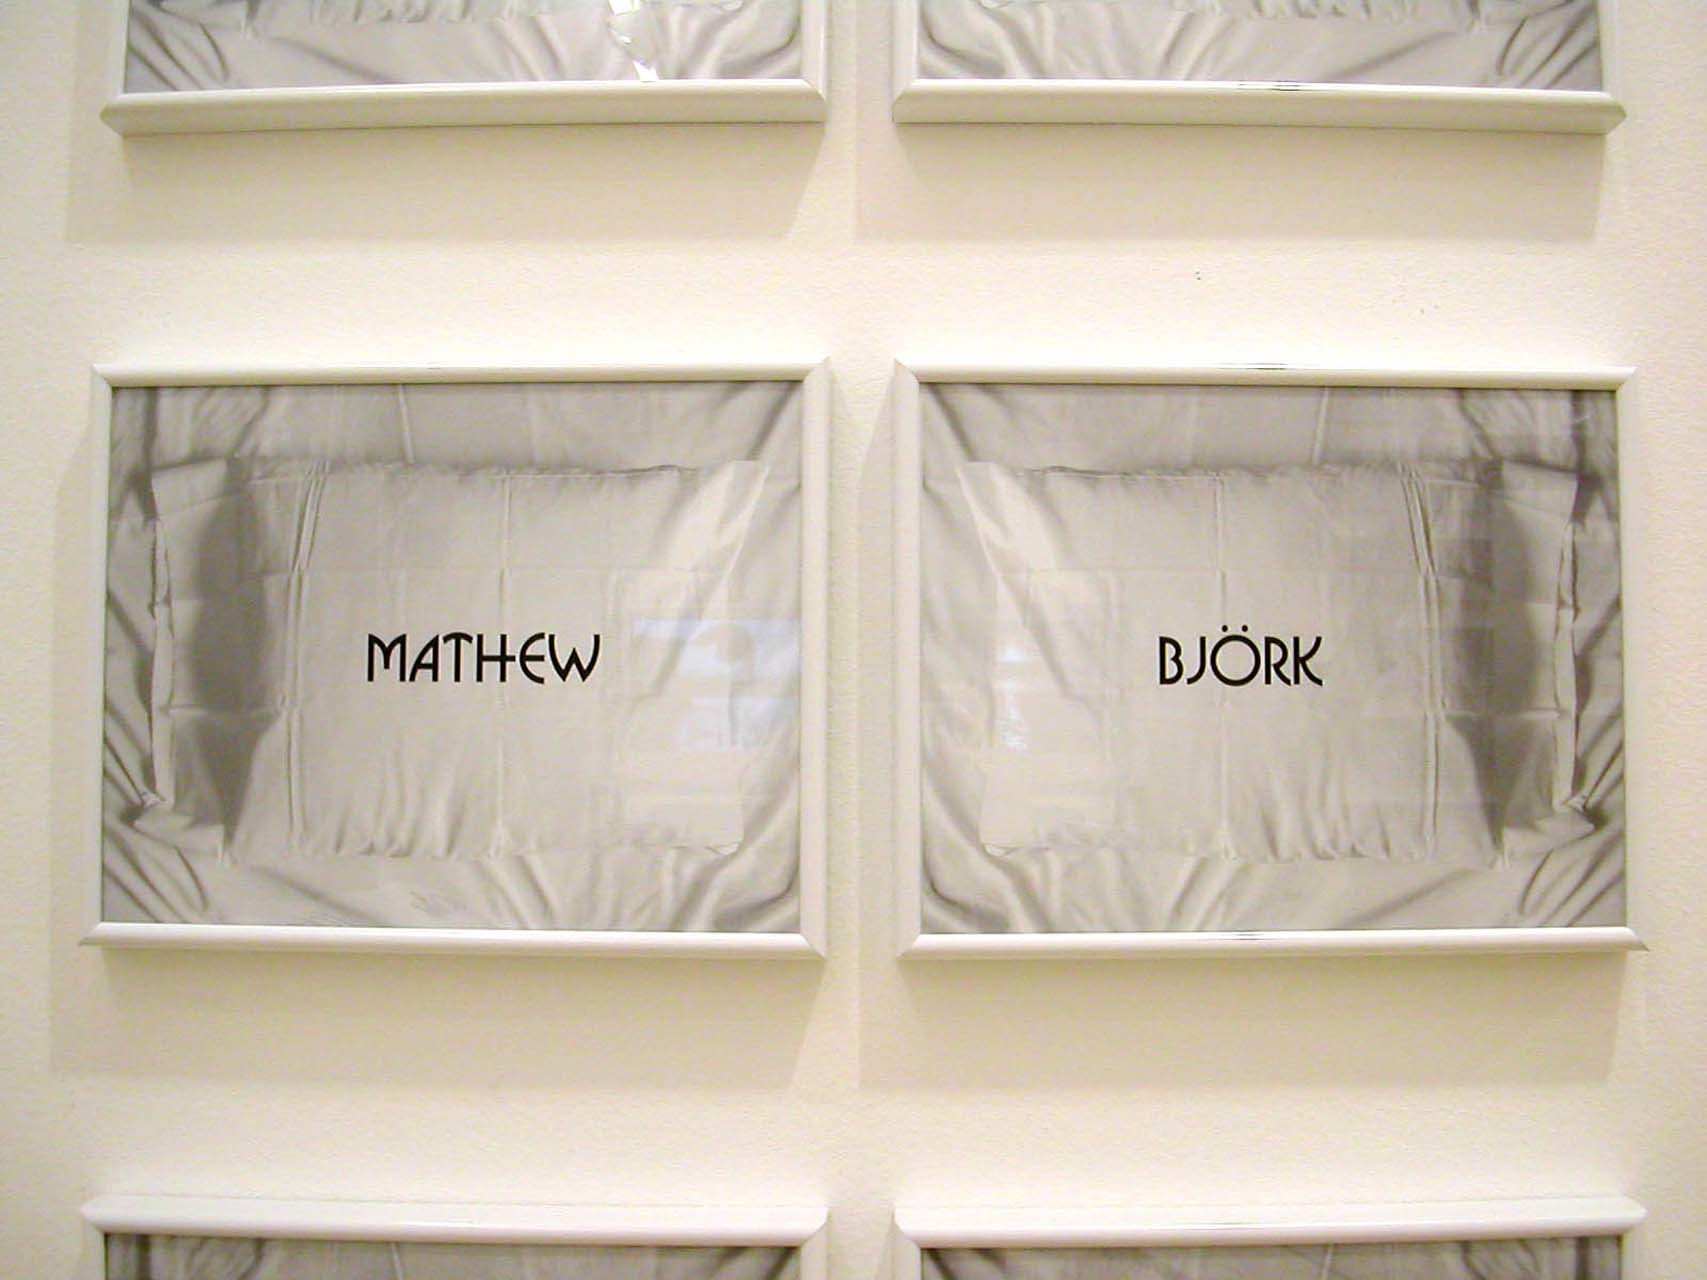 "<div class=""artwork_caption""><p>Matthew & Bjork, 2002</p></div>"